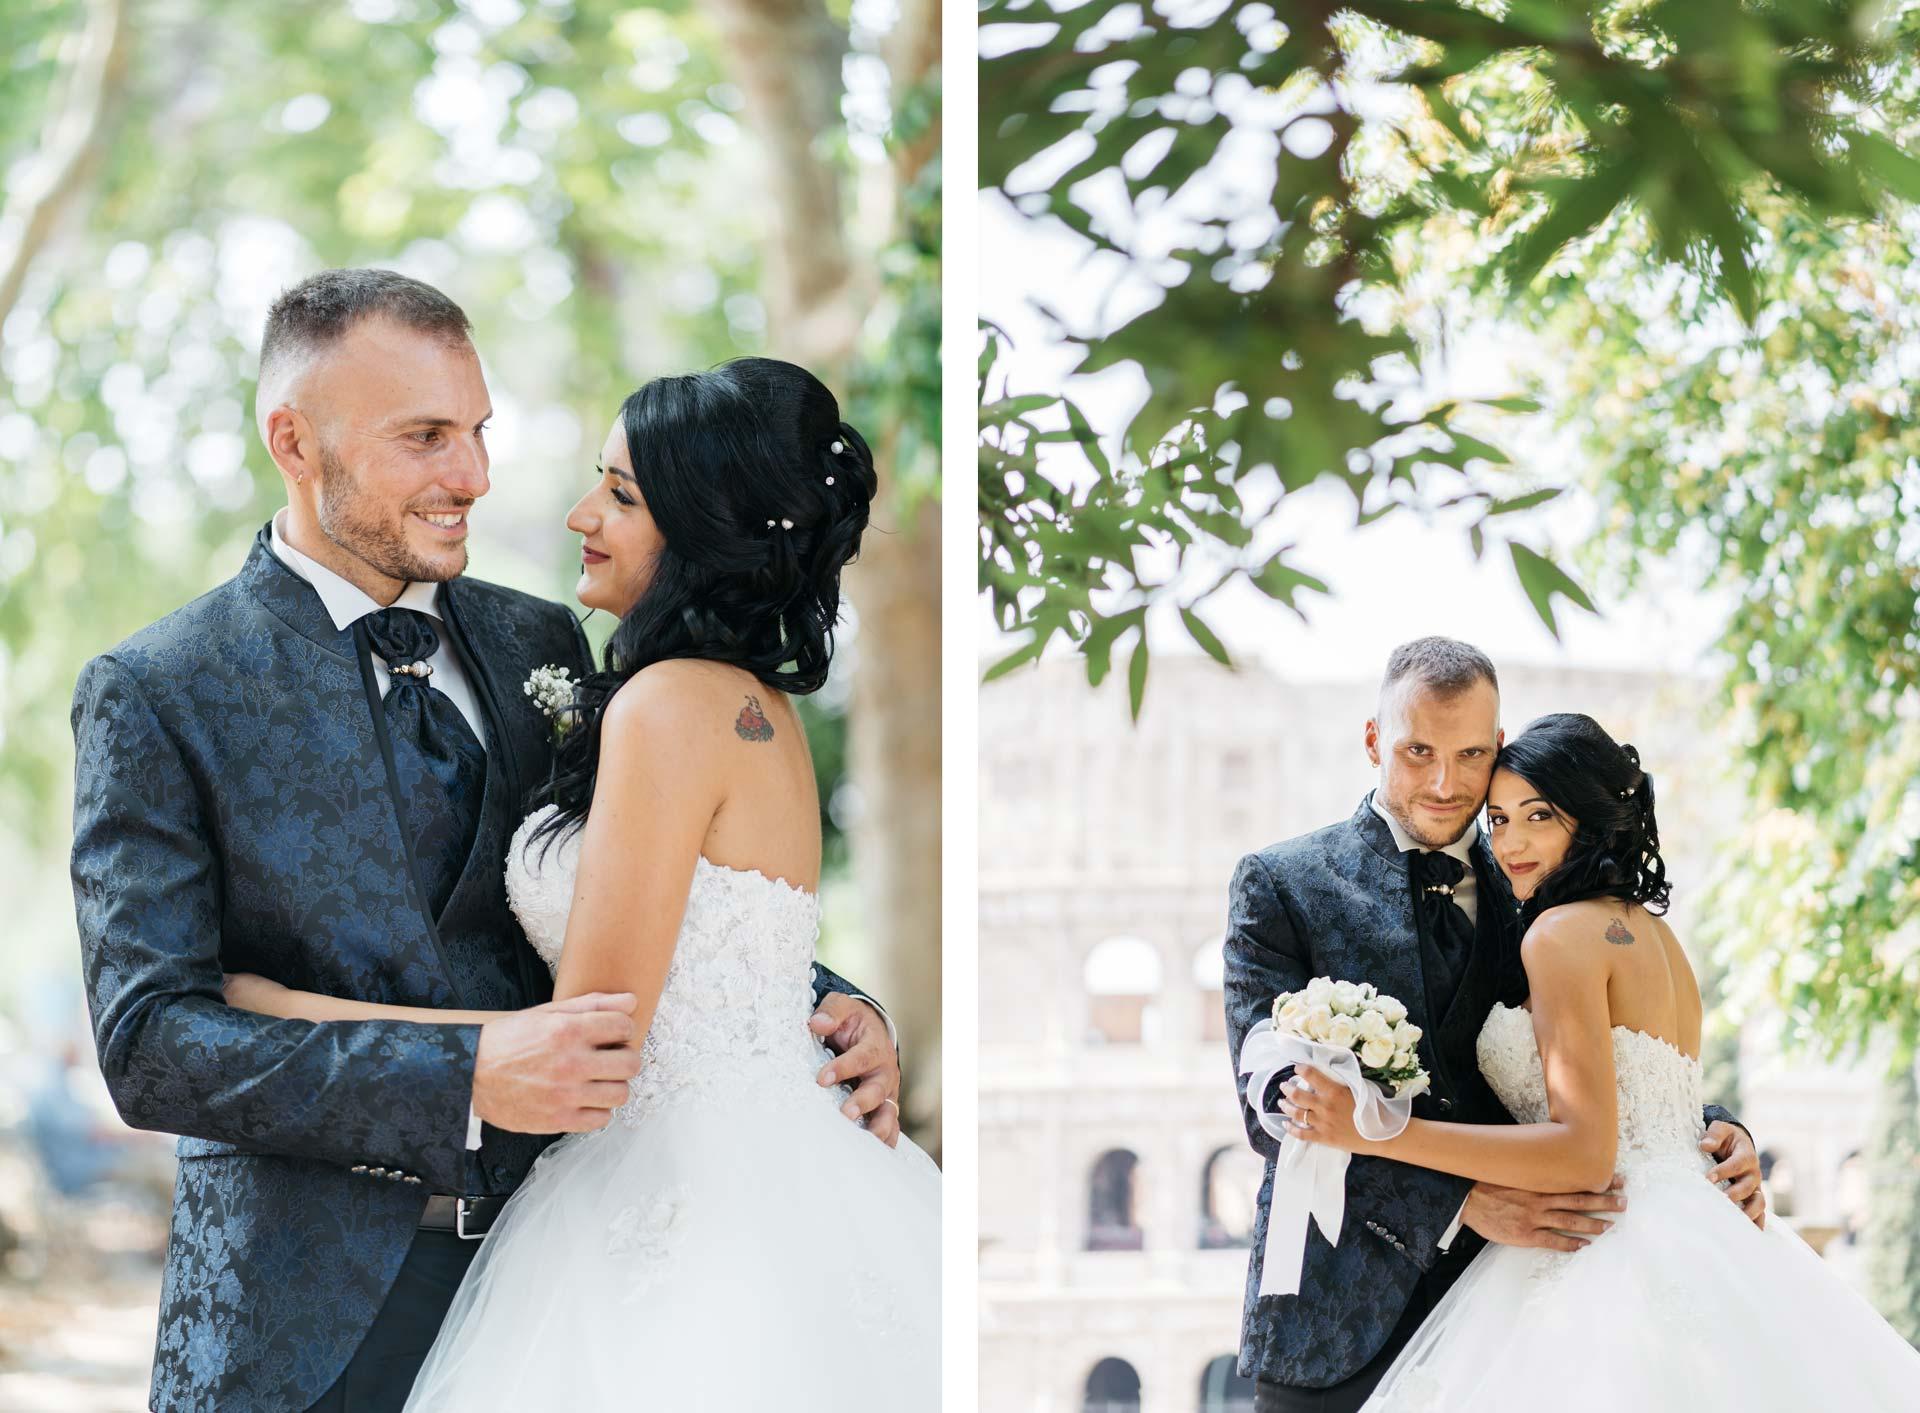 fotografo-matrimonio-reportage-roma-1-simone-nunzi